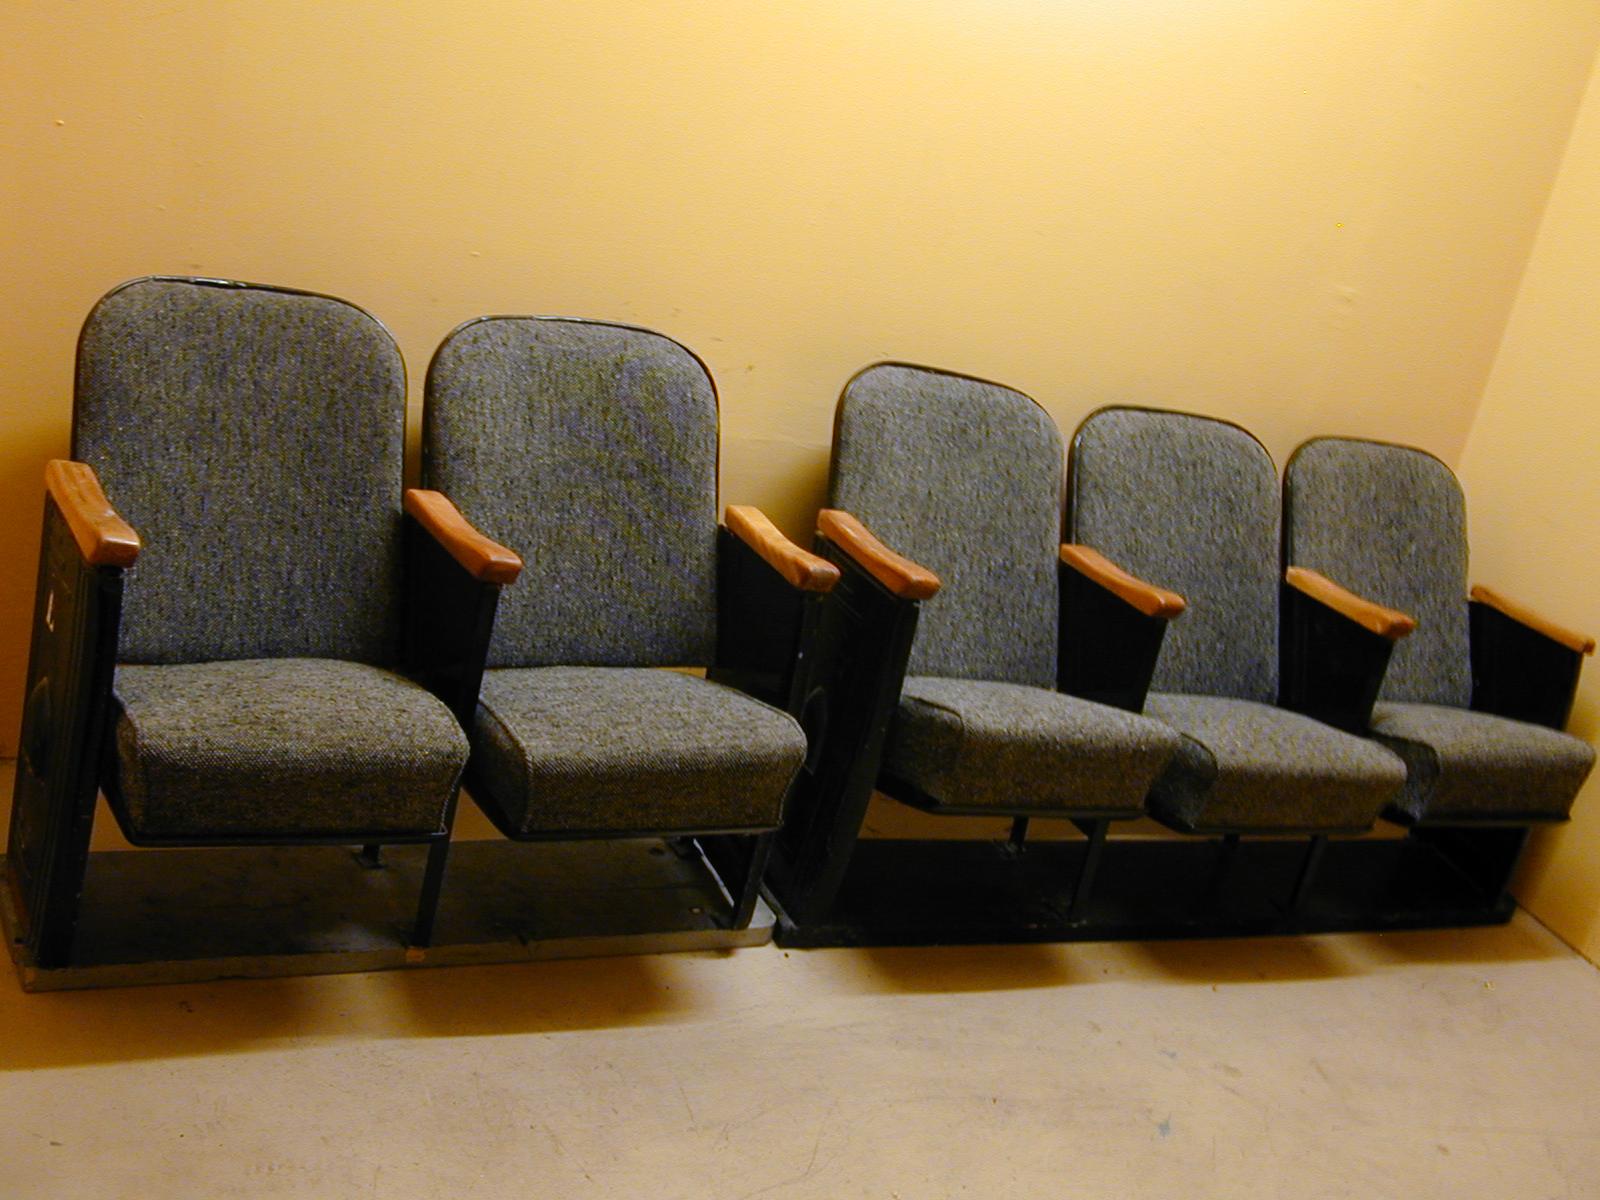 theatre seats, grey.JPG